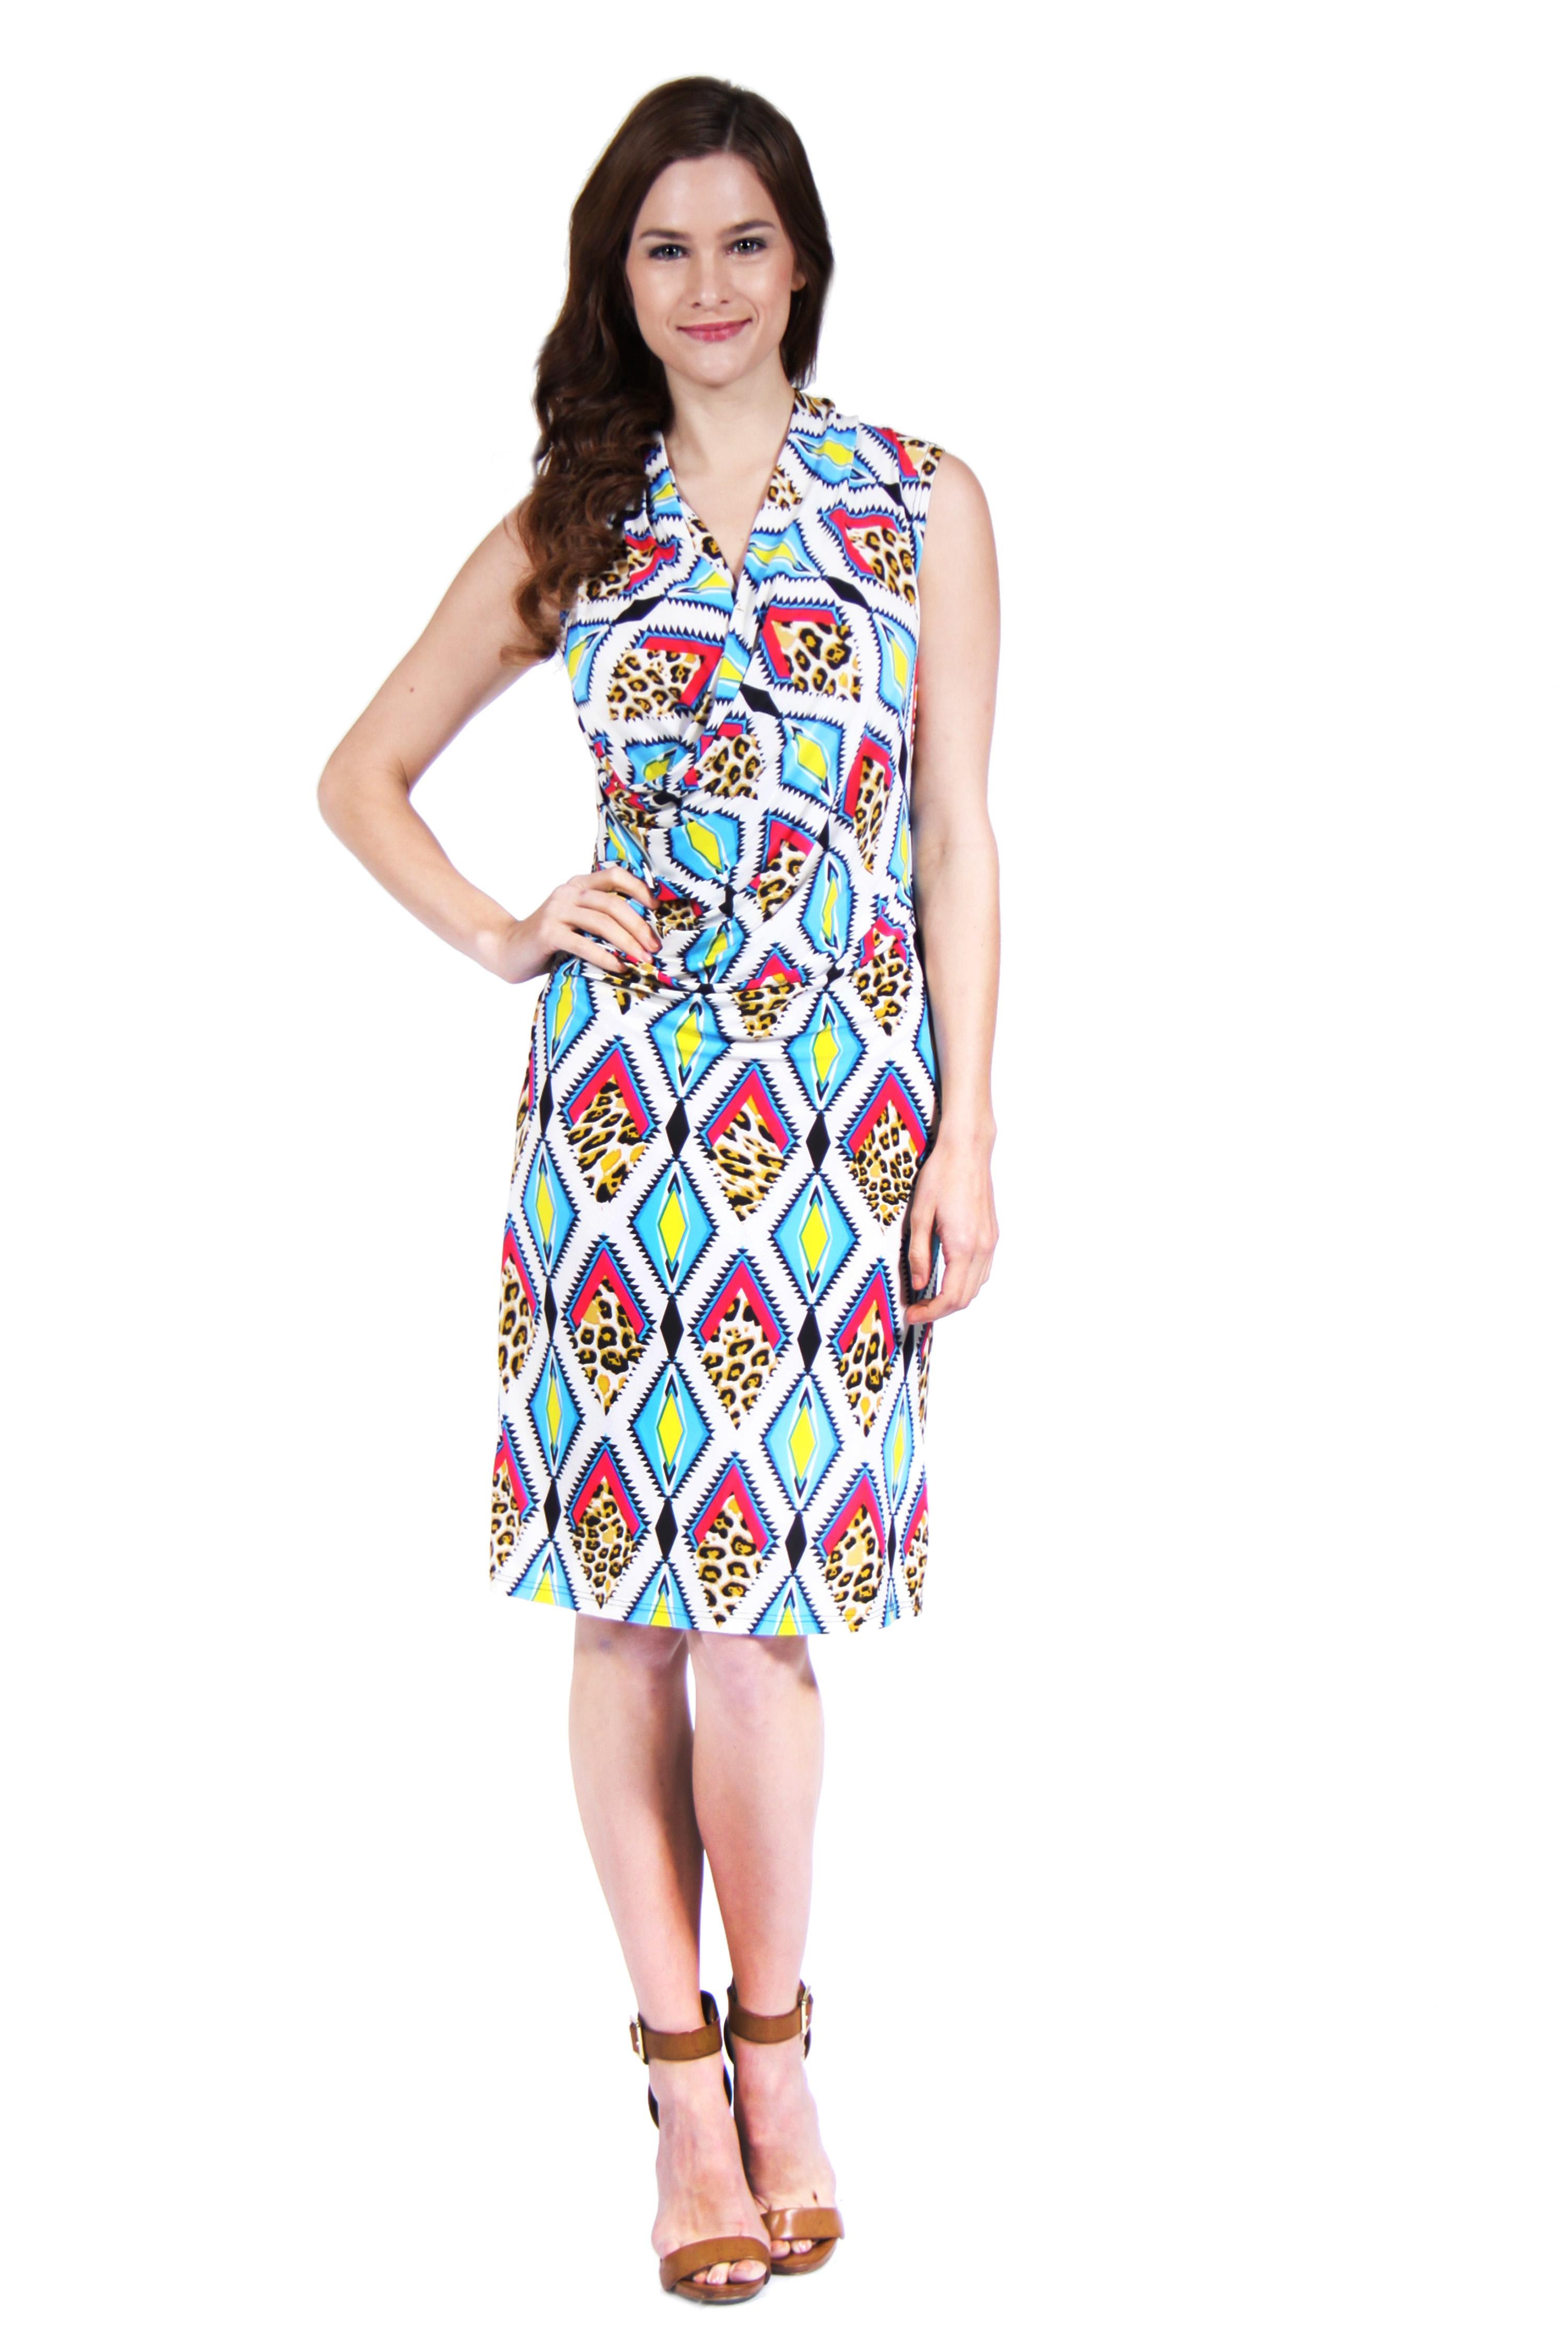 24/7 Comfort Apparel Women's Diamond Cheetah Print Dress